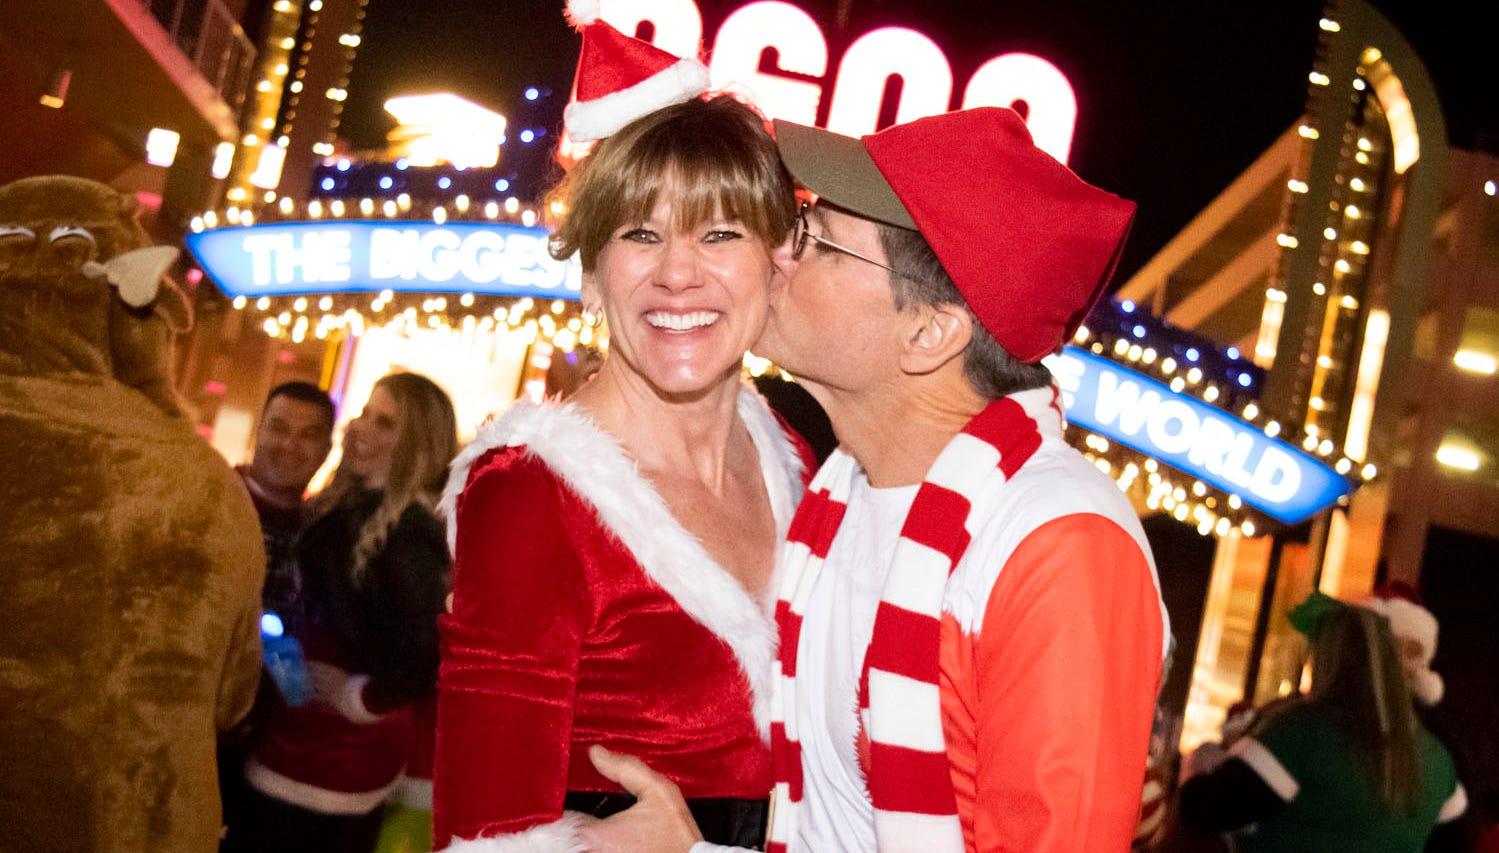 Elves, Christmas trees, Grinches, and yes, Santas, all get merry at the Reno Santa Pub Crawl on Saturday, Dec. 15, 2018.